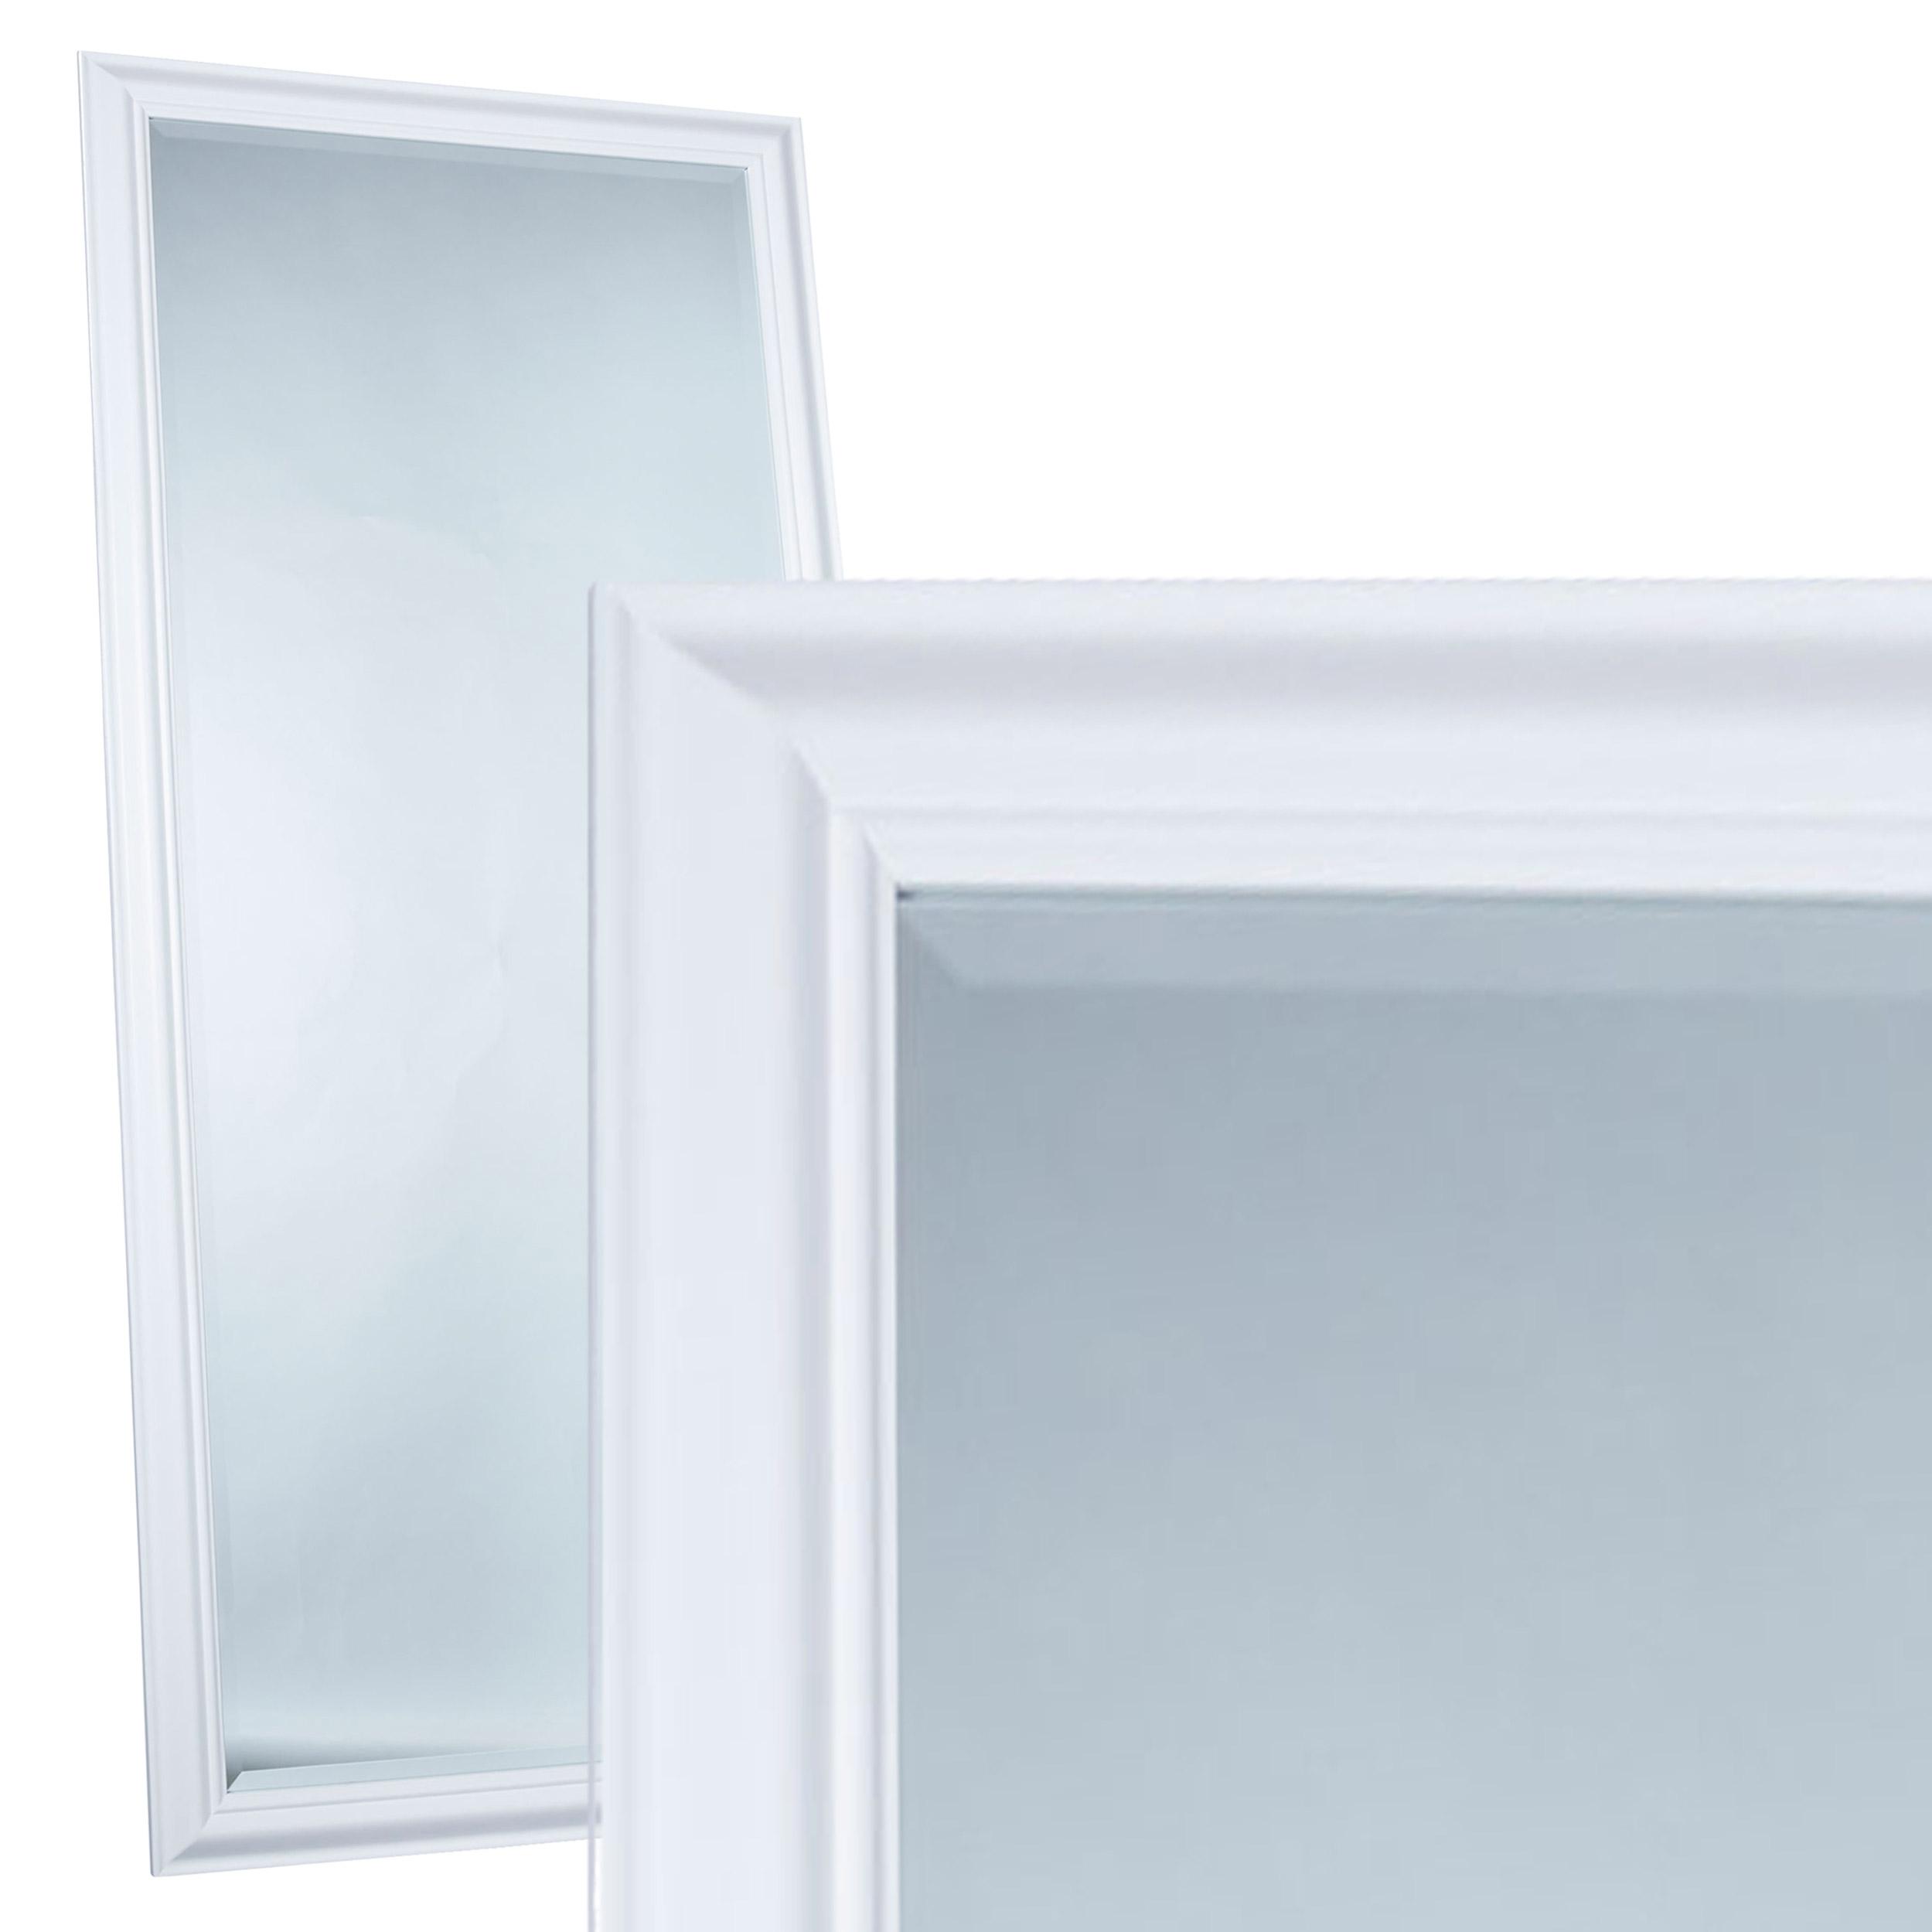 Wandspiegel spiegel ca 180 x 80 cm wei schlichter - Wandspiegel facettenschliff ...